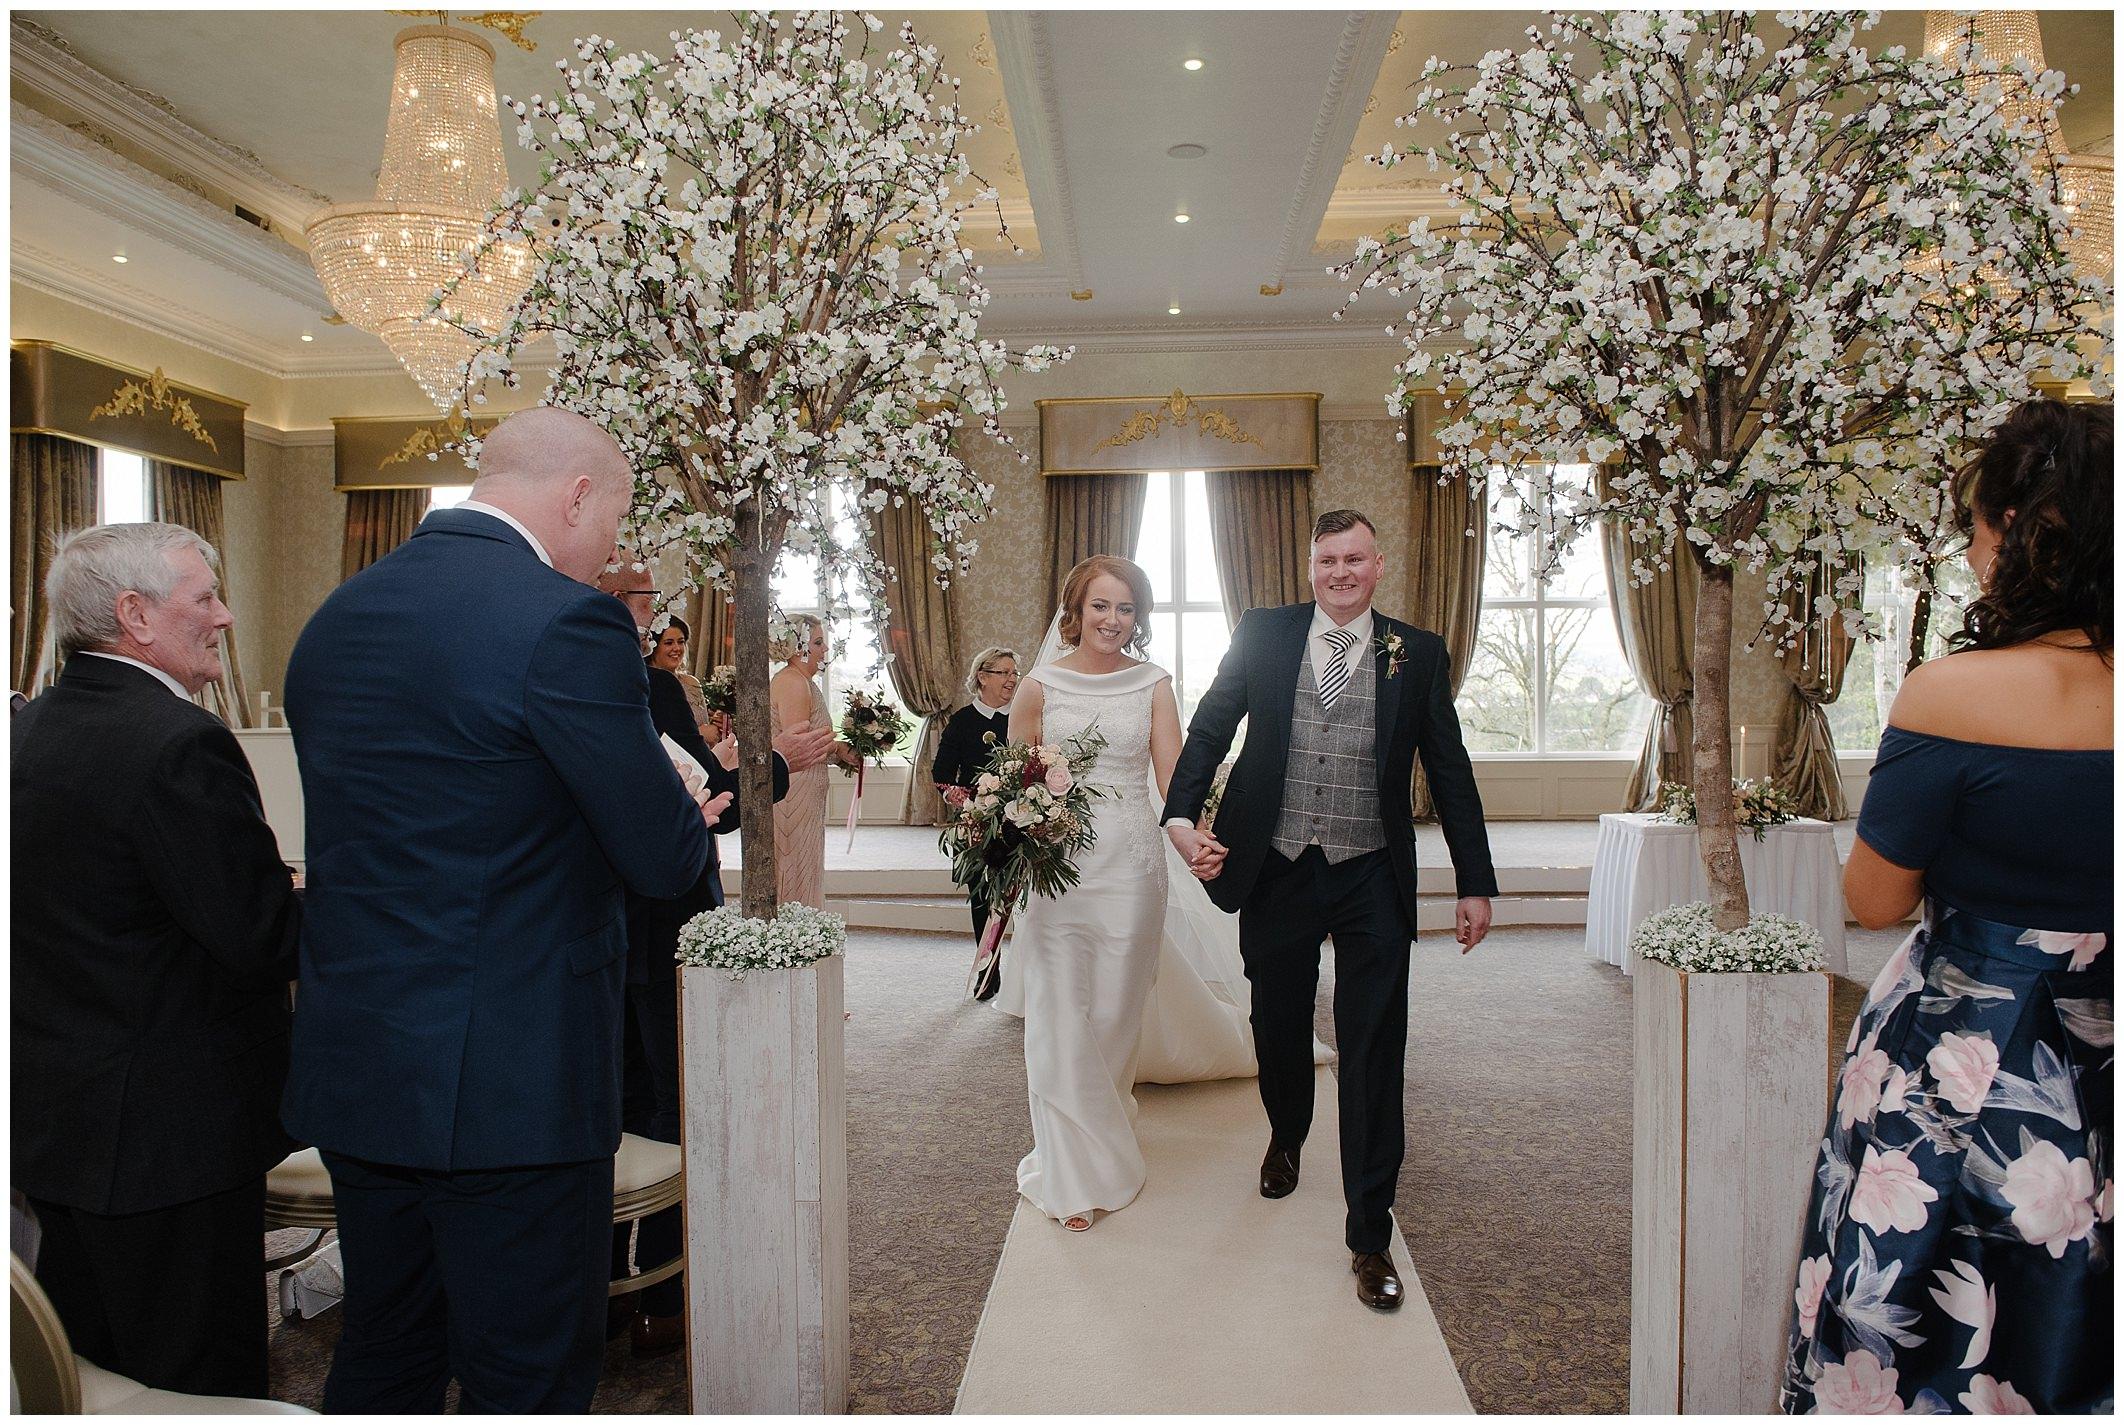 corick-house-wedding-hannah-gary-jude-browne-photography_0043.jpg